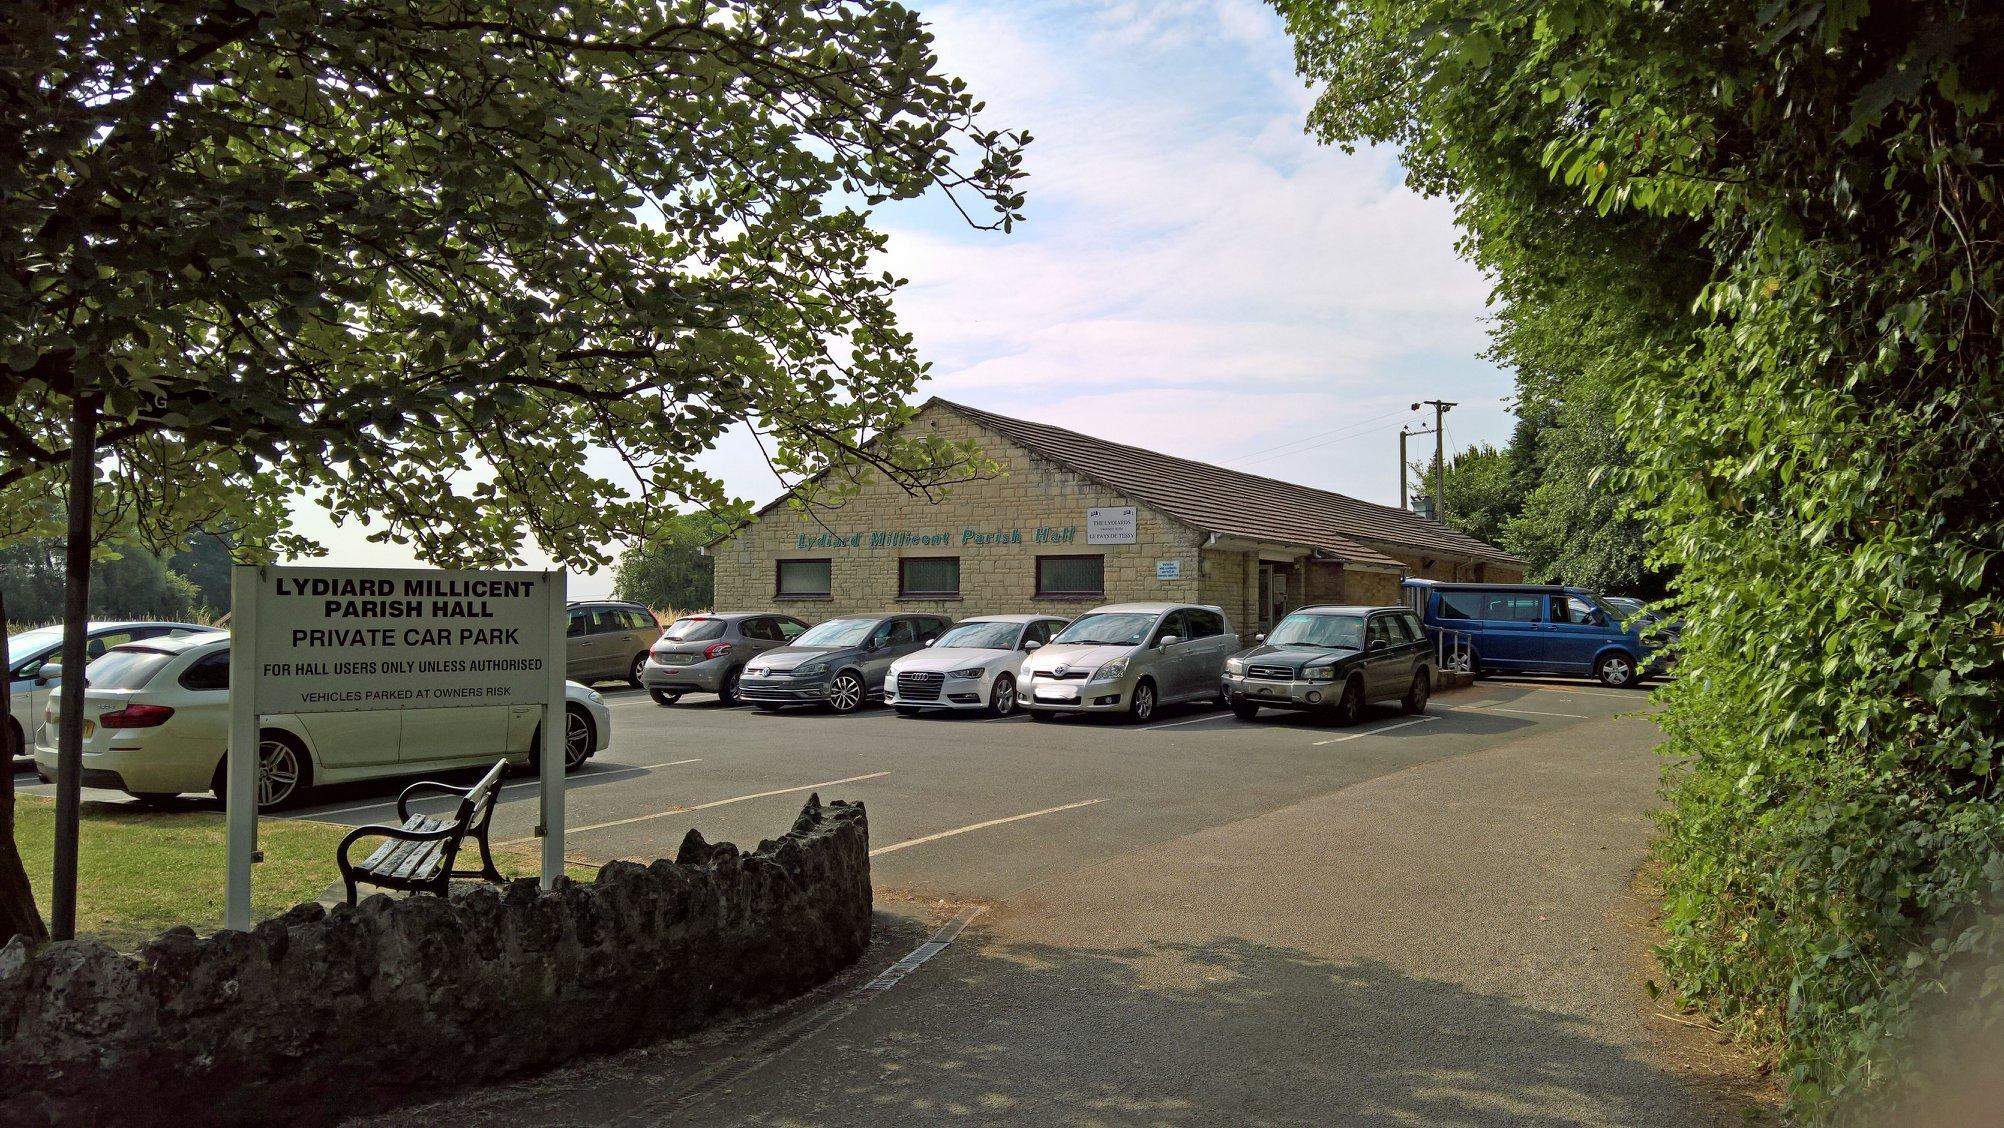 Lydiard Millicent Parish Hall